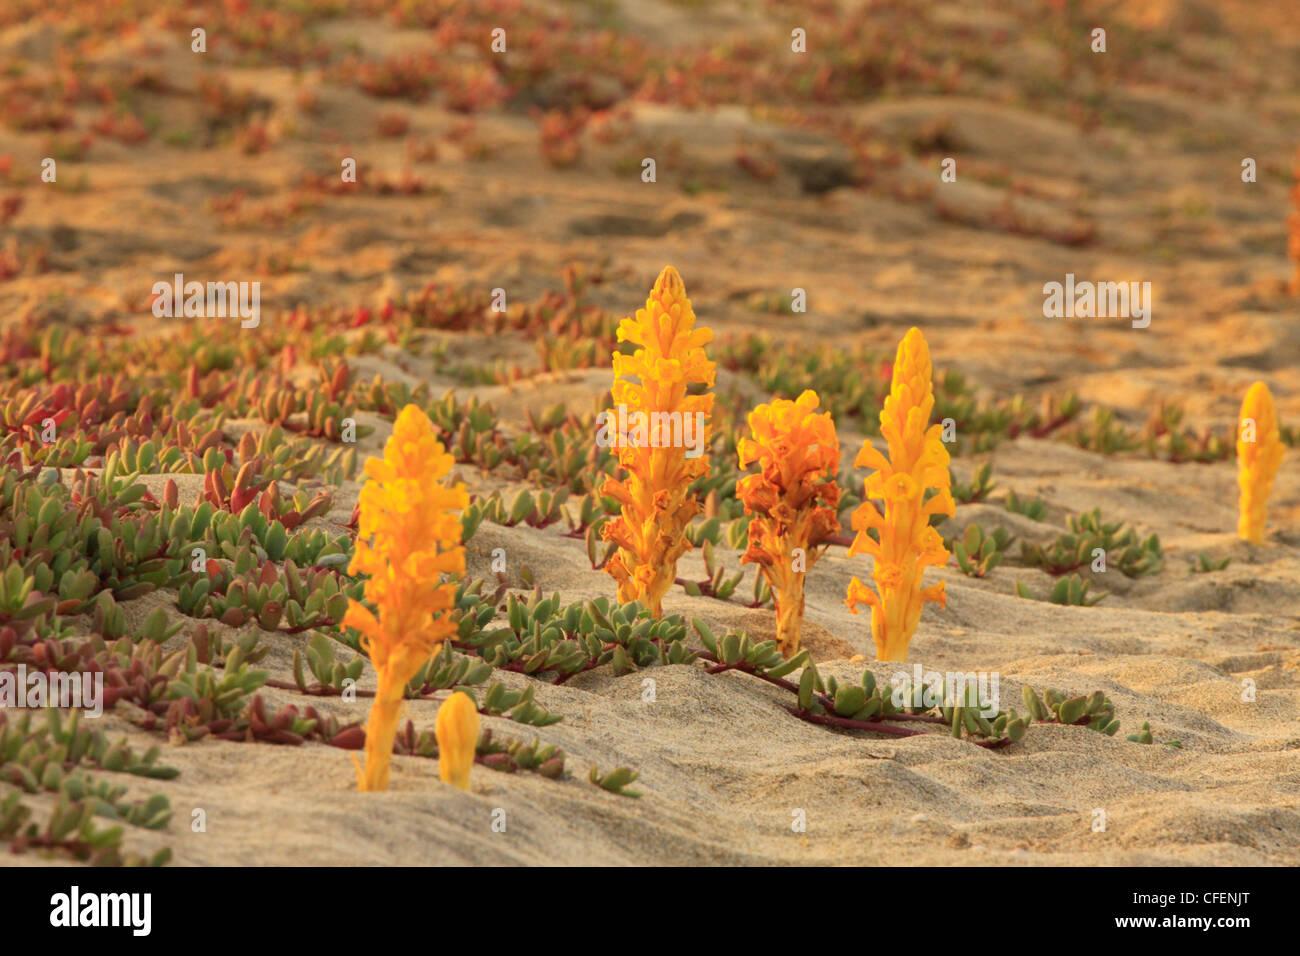 Cistanche phelypaea Yellow Broomrape Stock Photo